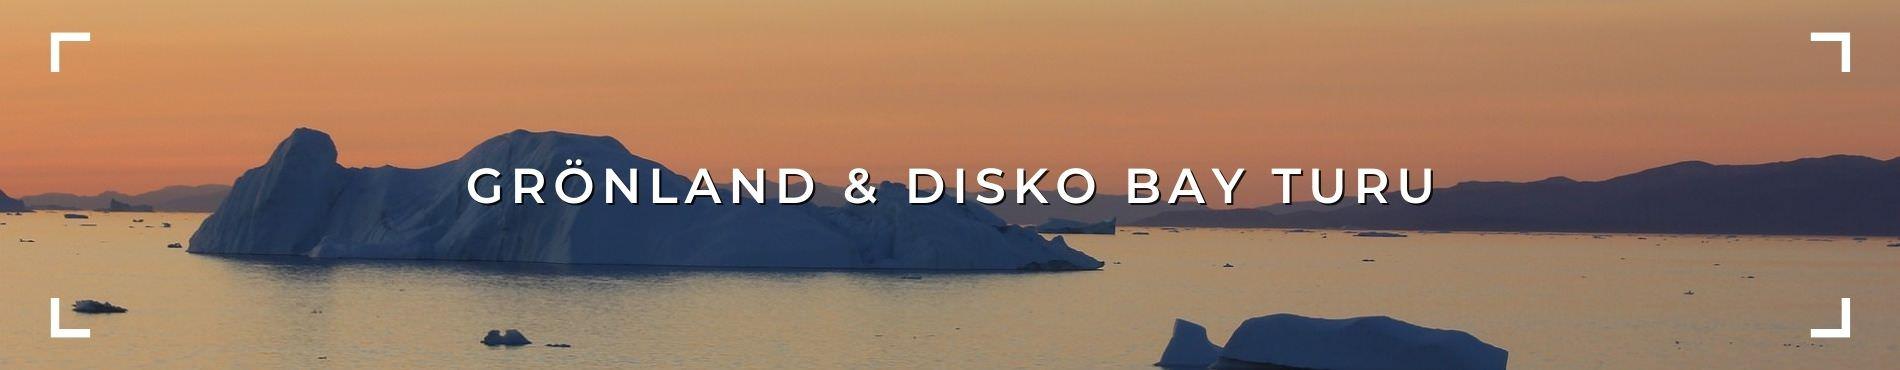 GRÖNLAND & DISKO BAY TURU